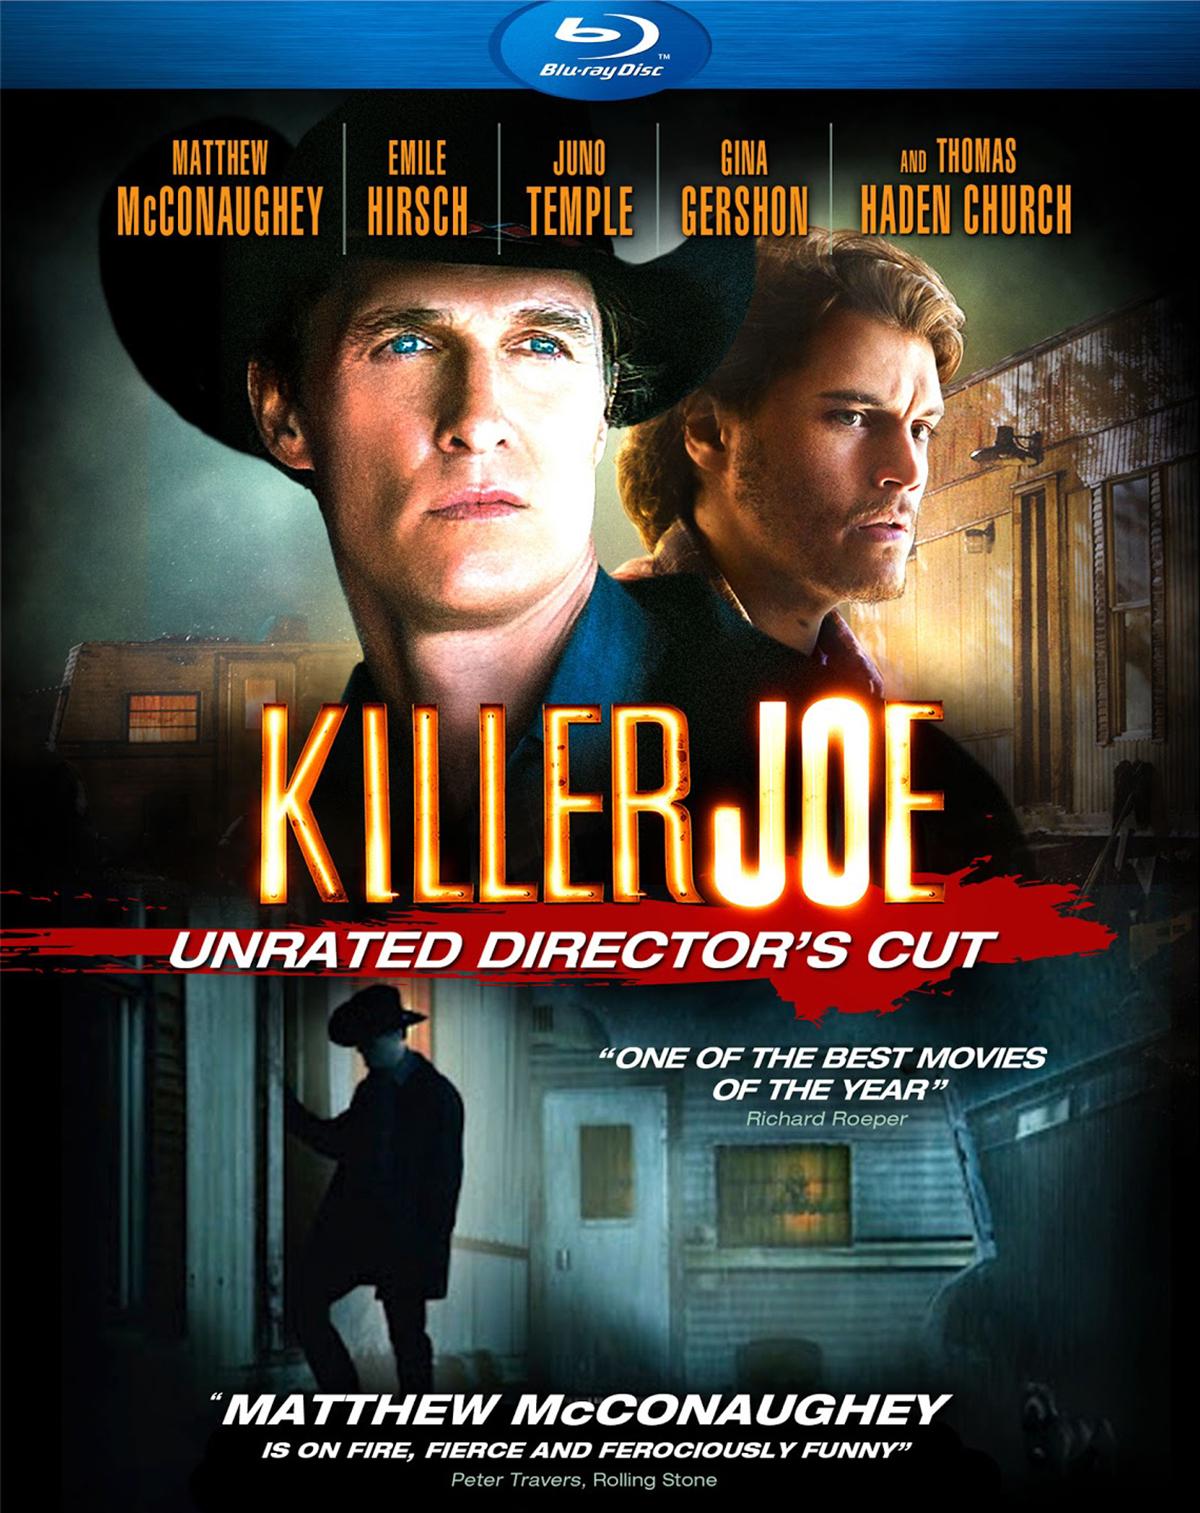 Blu-ray Review: Killer Joe - Slant Magazine